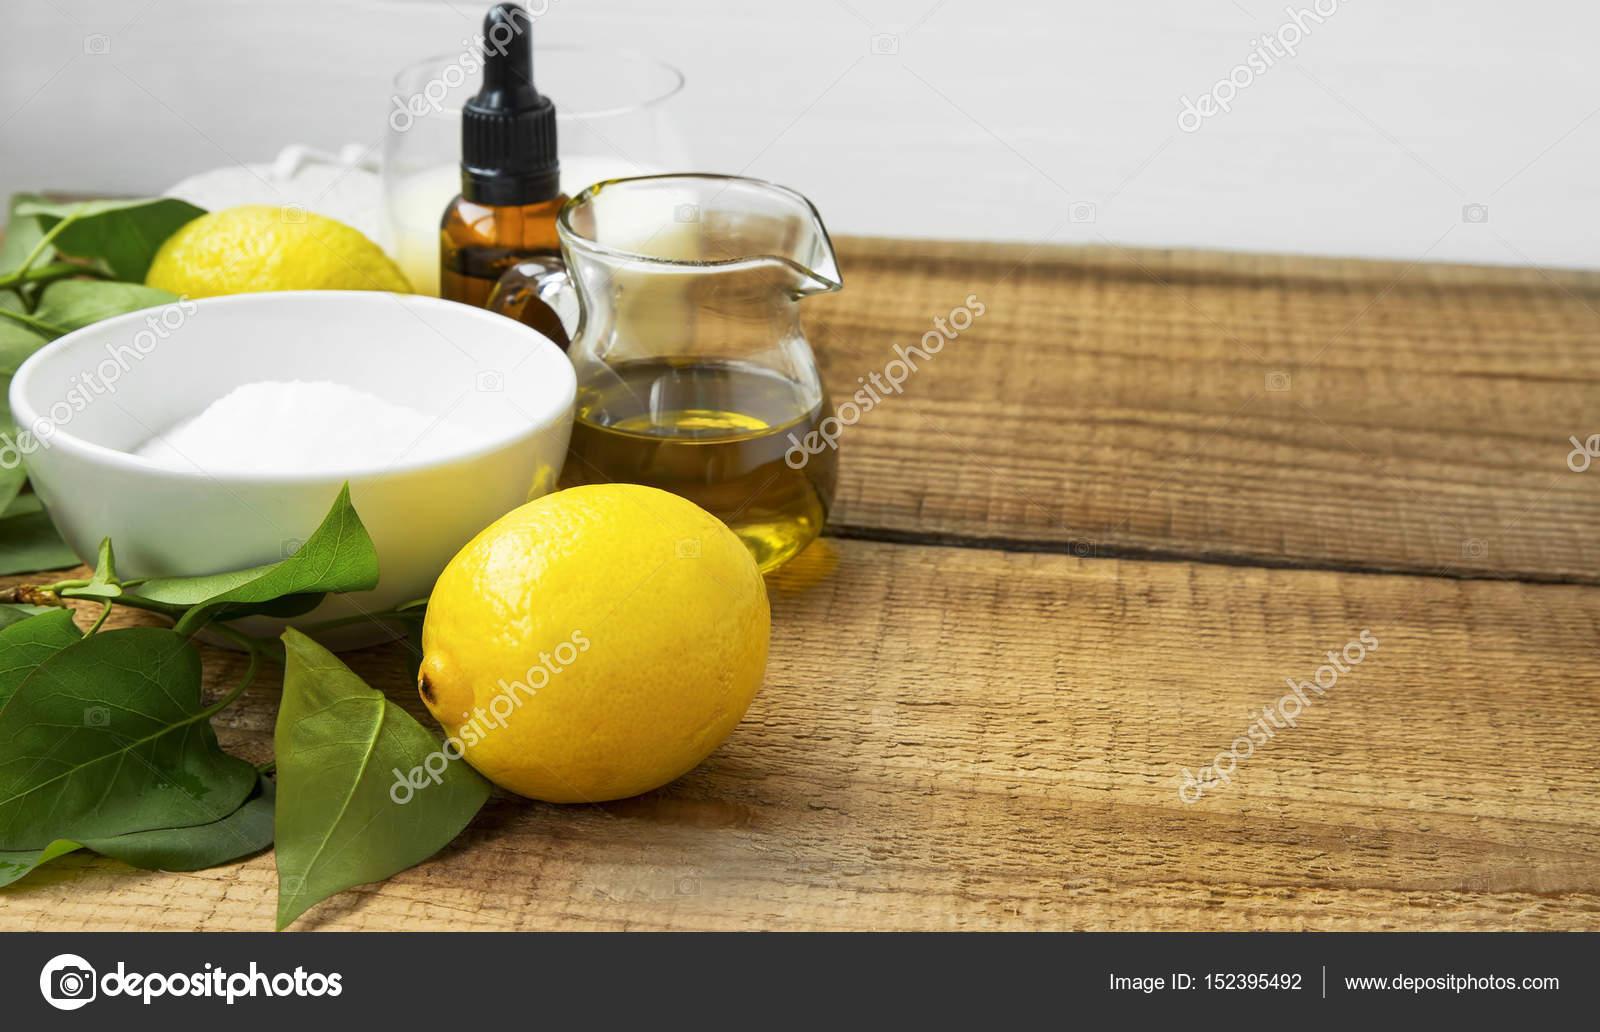 limon+con+bicarbonato+piel